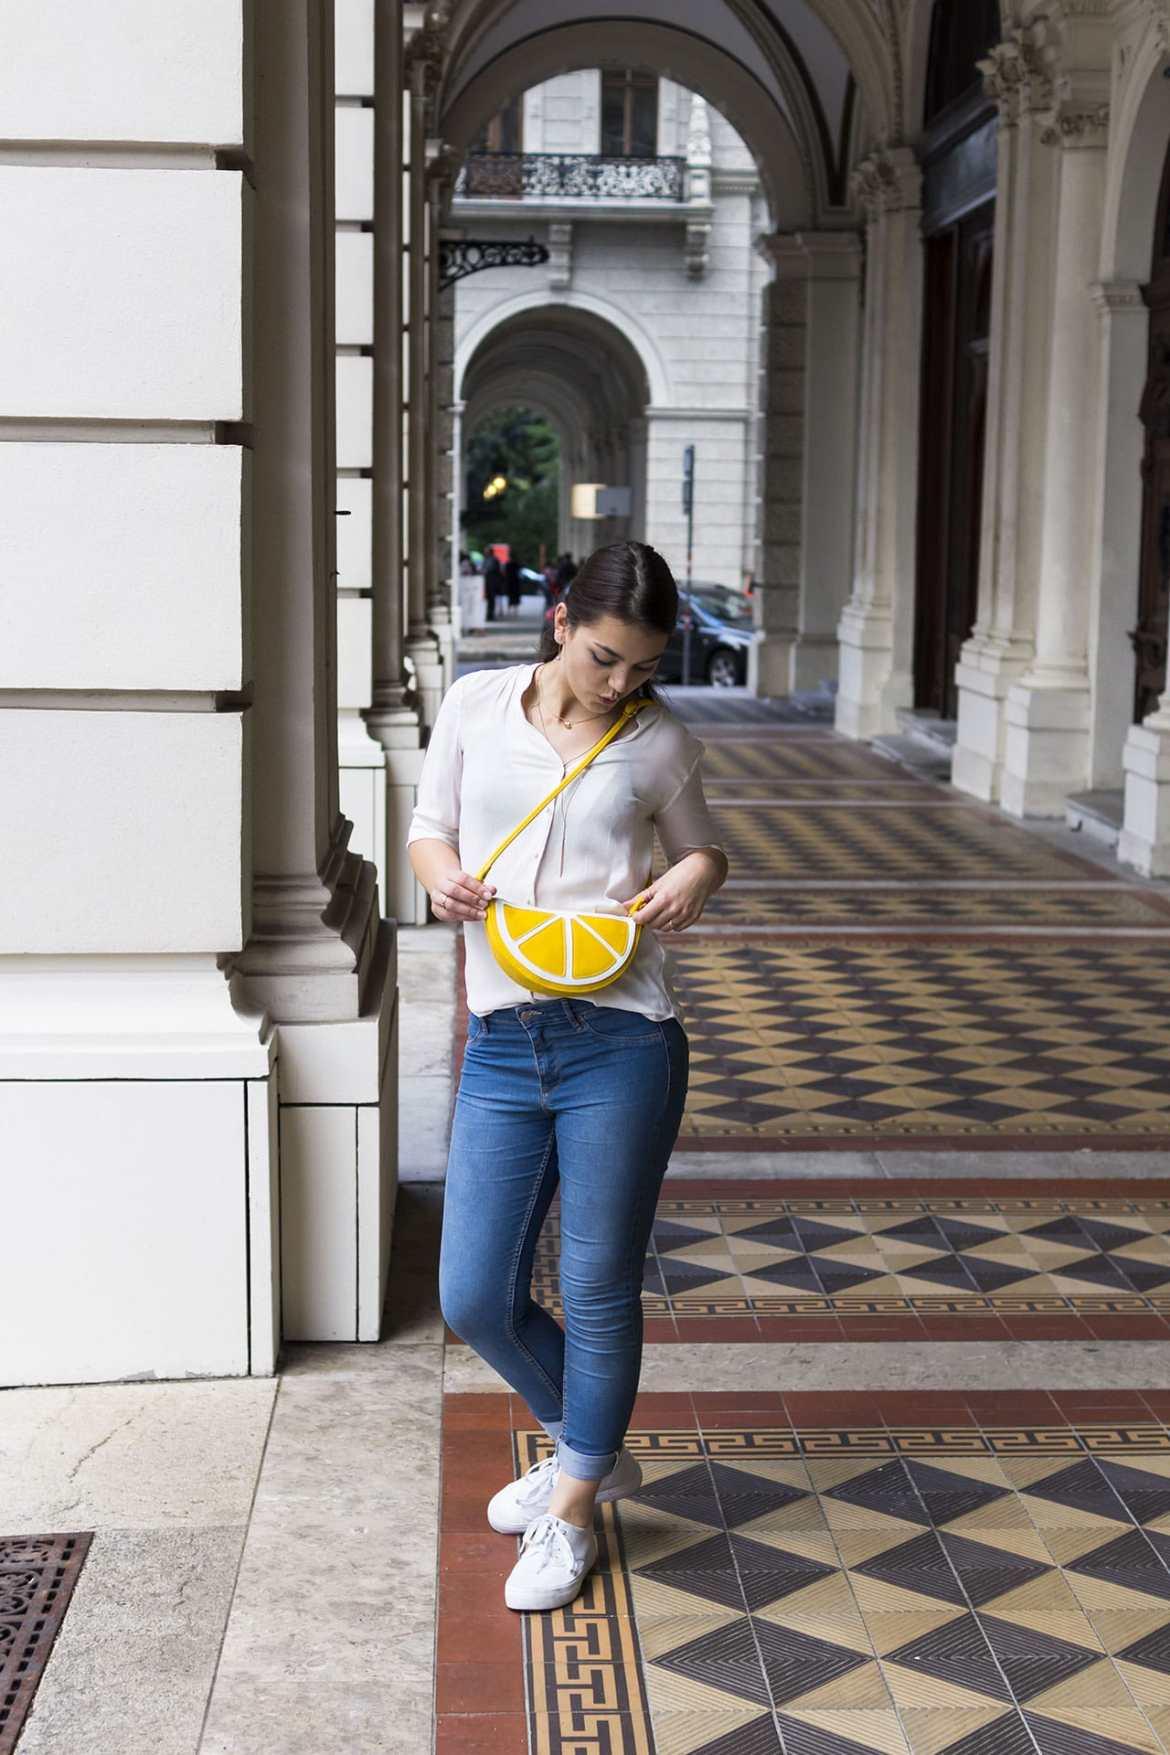 White Blouse H&M bölue jeans H&M white Shoes even&odd and citrus handbag the dorie looks in it